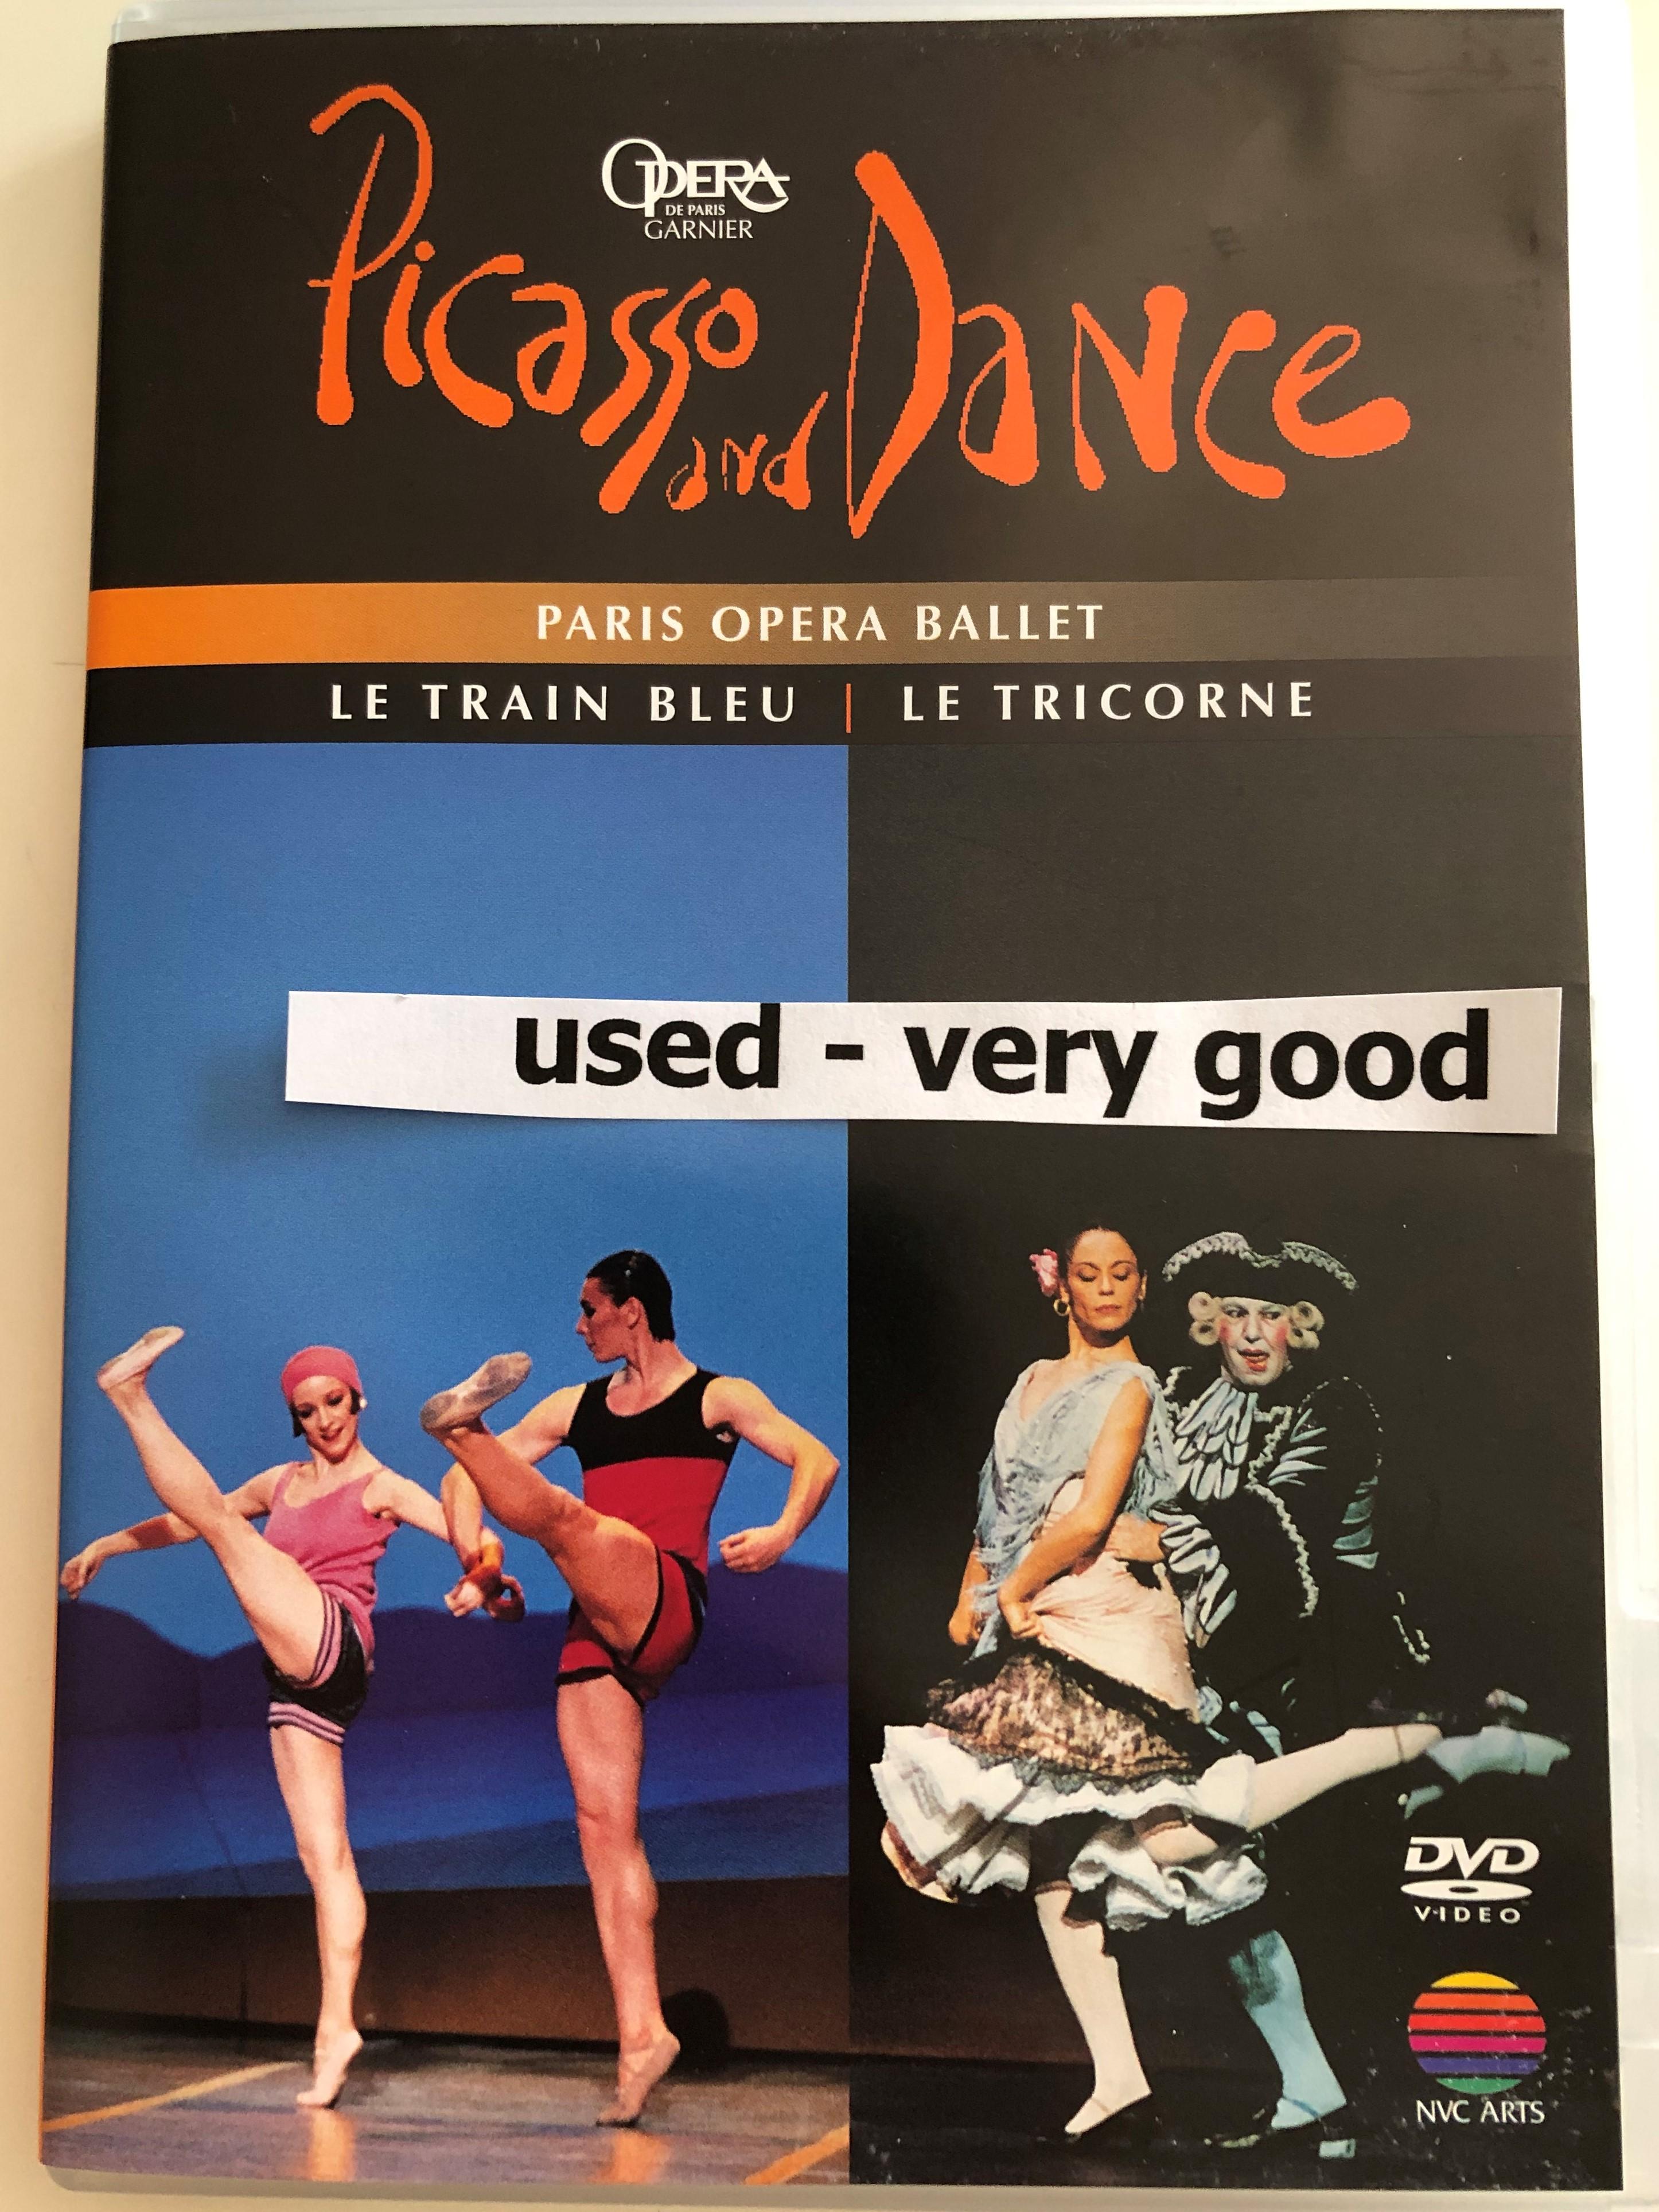 picasso-and-dance-dvd-1994-paris-opera-ballet-2.jpg